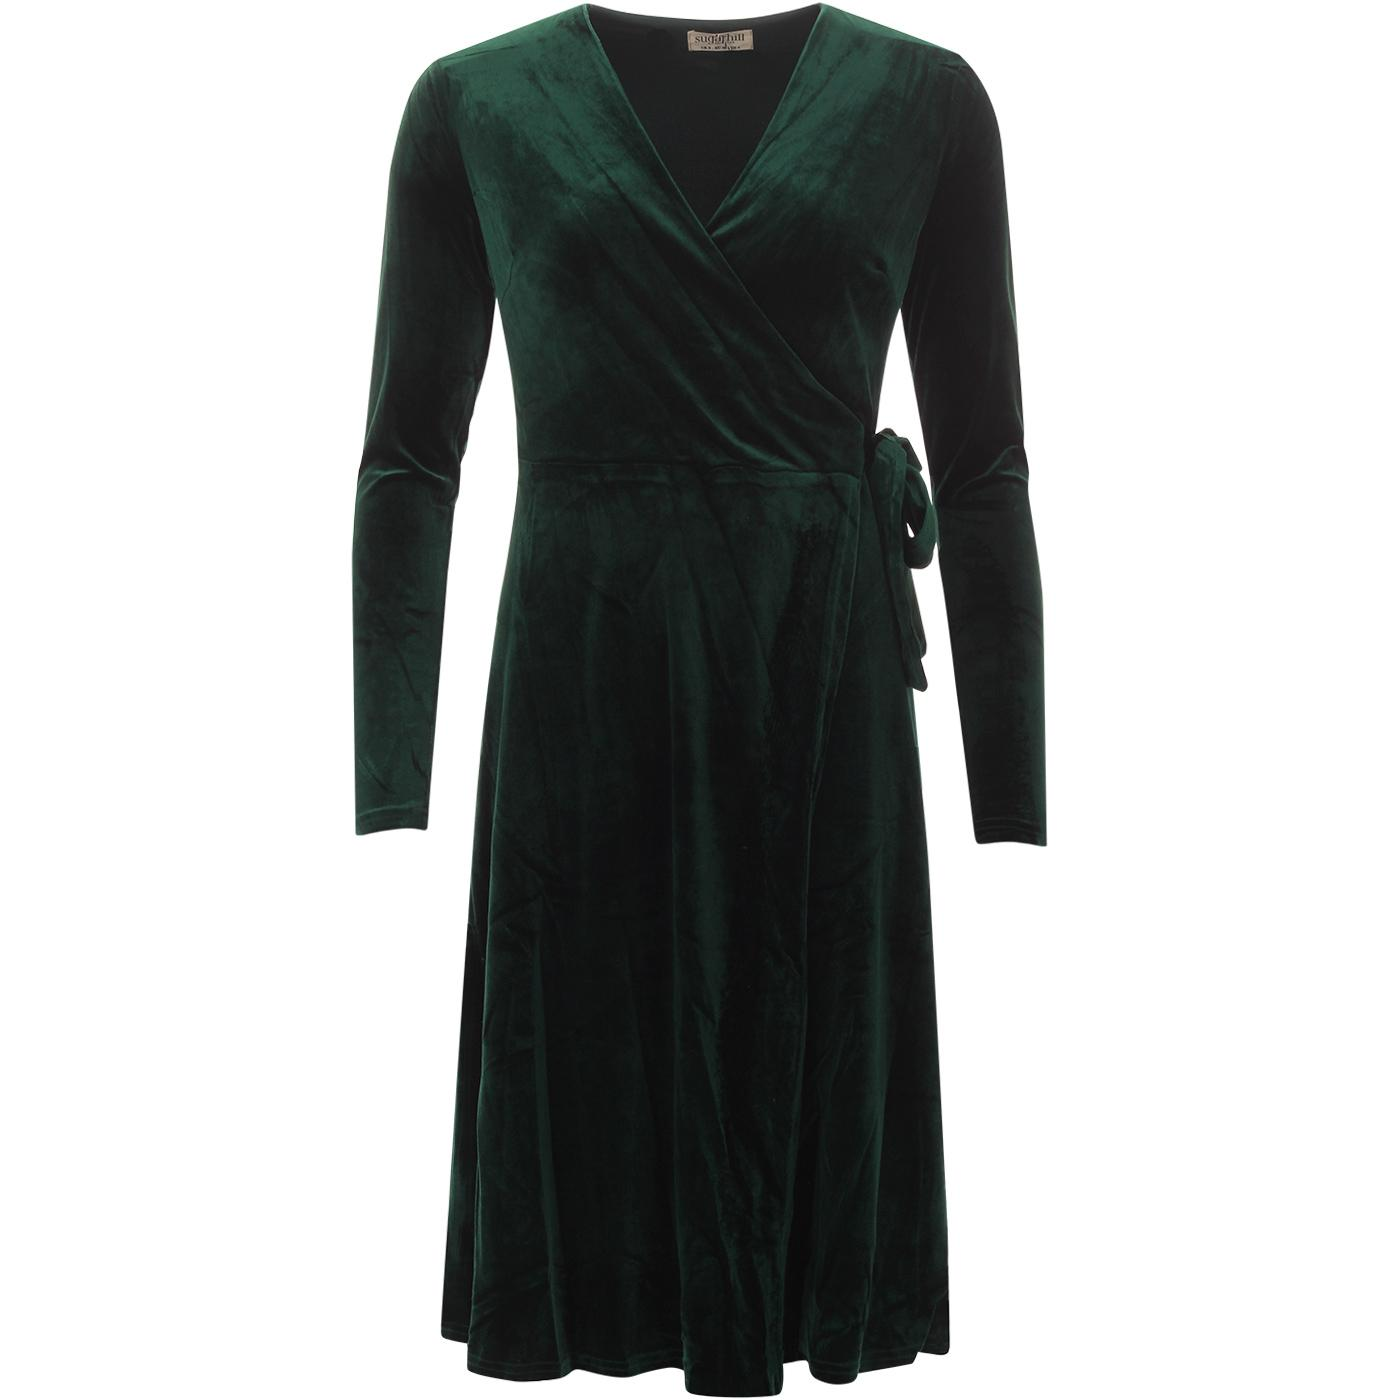 Trinity SUGARHILL BRIGHTON Velvet Midi Wrap Dress